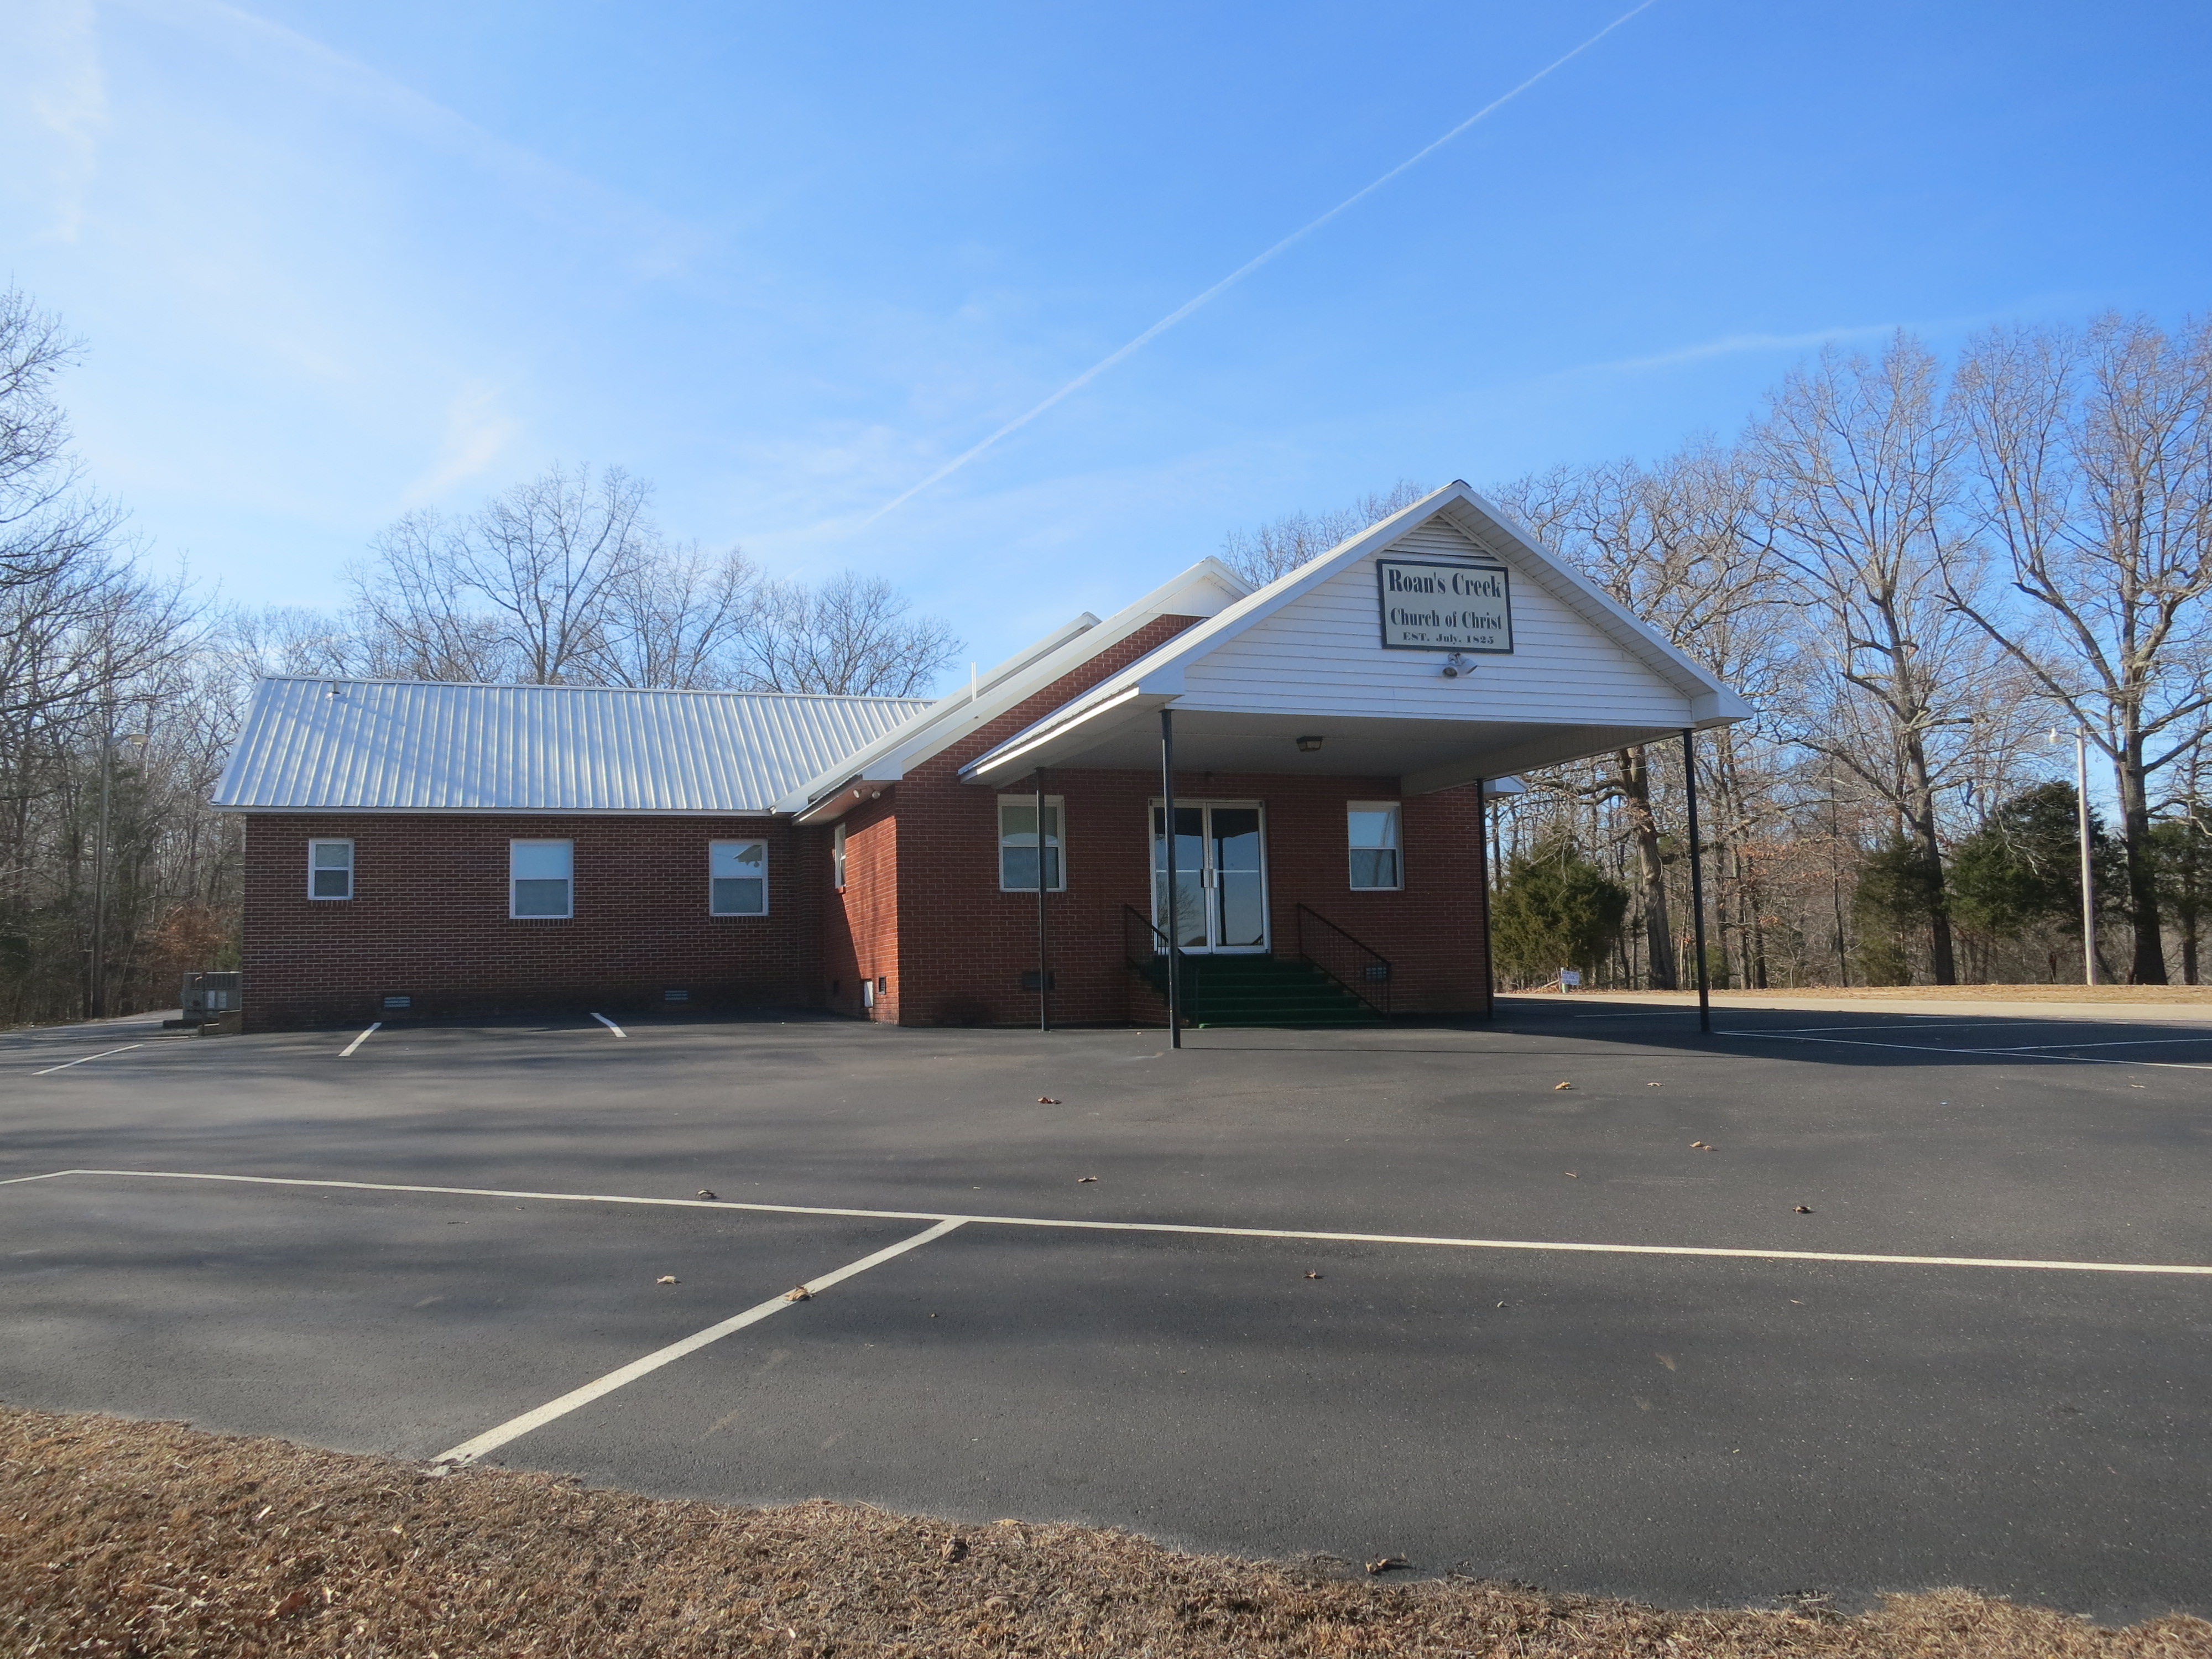 Tennessee carroll county clarksburg - Roans_creek_c_of_c Jpg